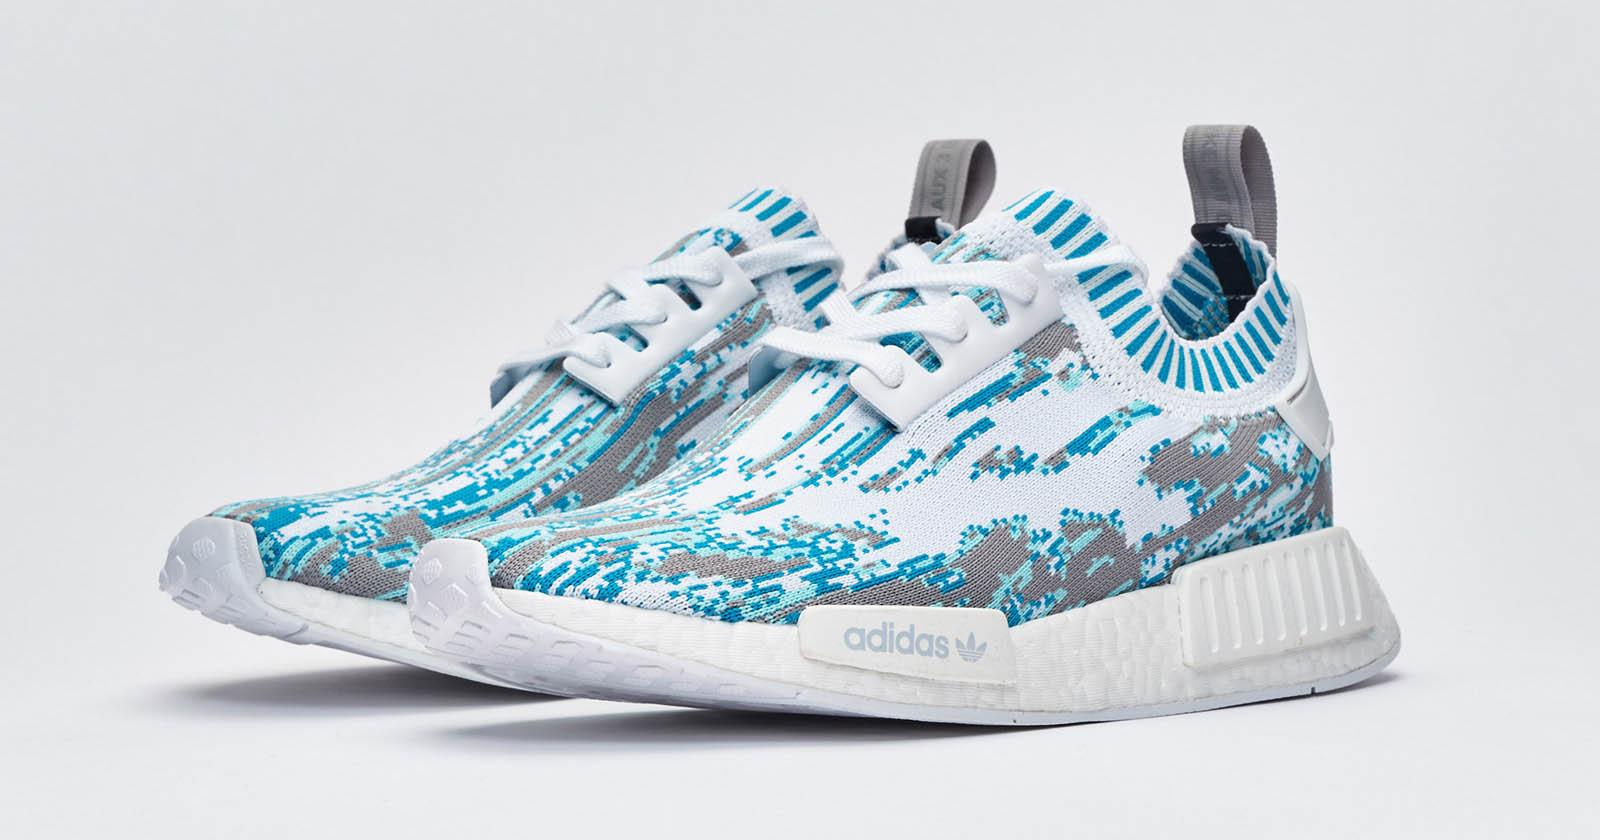 Sneakersnstuff x Adidas NMD R1 PK Datamosh Pack Aqua Grey